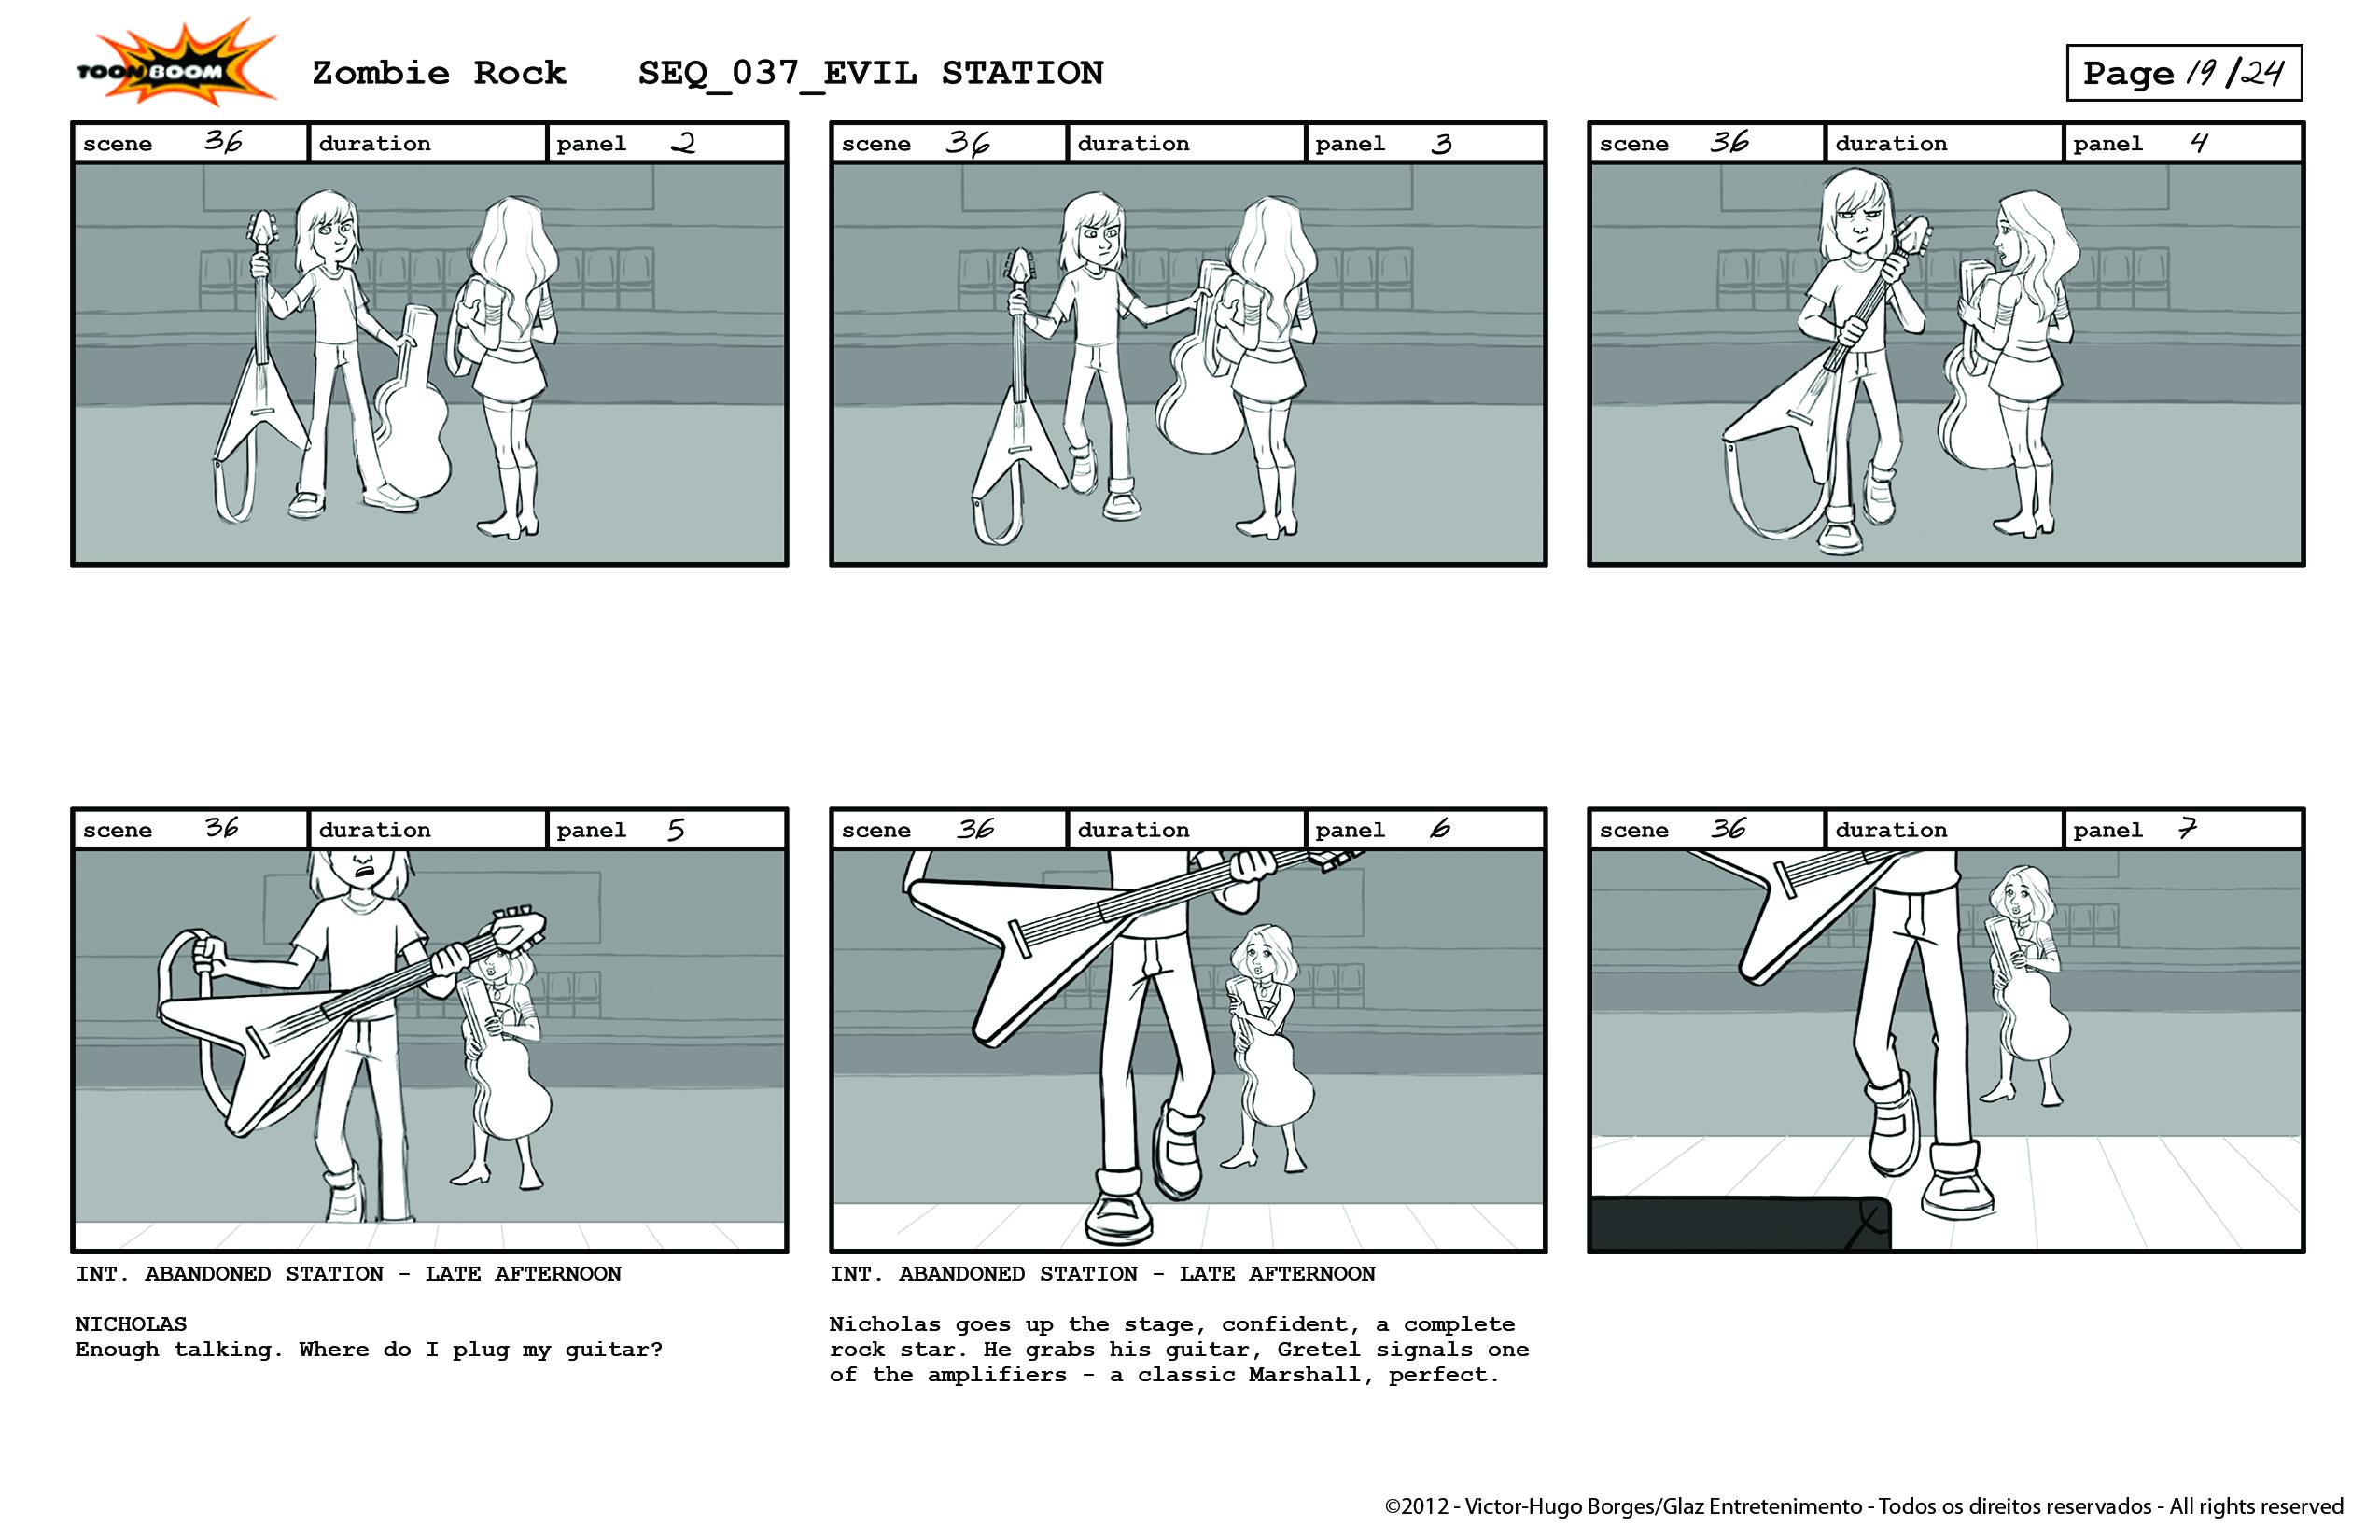 SEQ037_Evil Station_page19